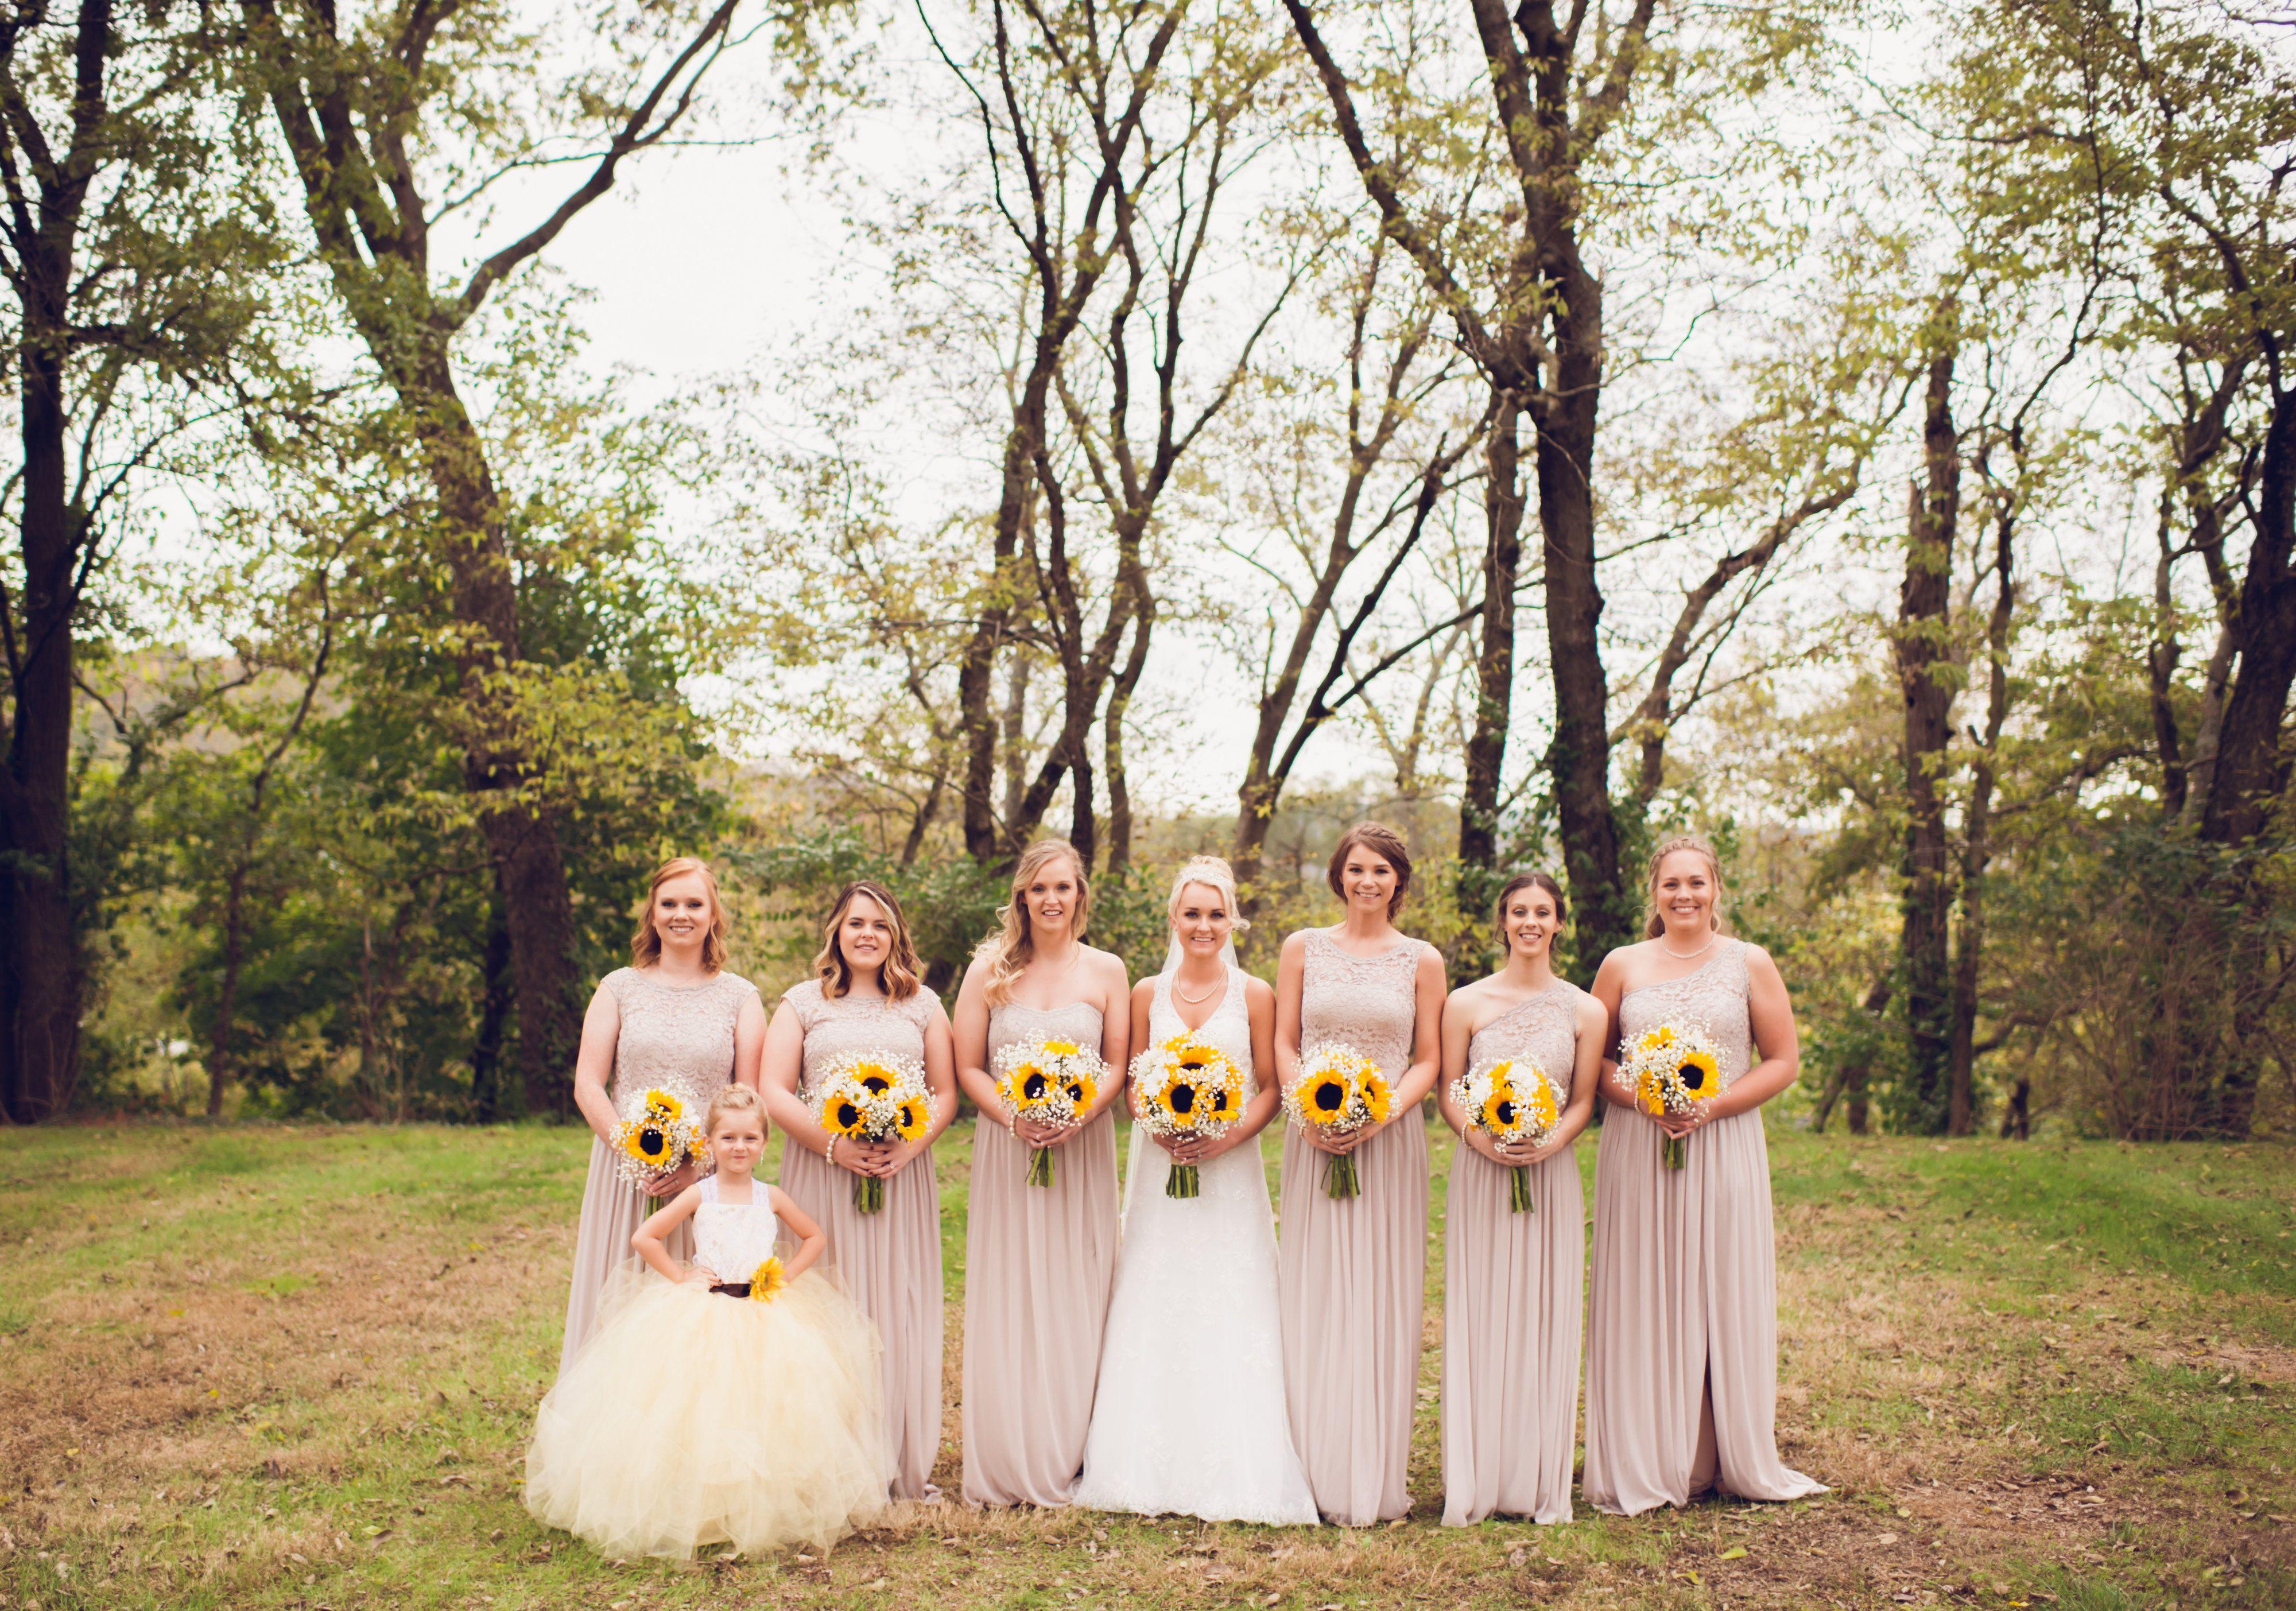 David S Bridal Bridesmaid Dresses Sunflower Wedding Bouquet Taupe Bridesmaid Dresses Biscotti Bridesmaid D Sunflower Wedding Bouquet Wedding Sunflower Wedding [ 2807 x 4000 Pixel ]